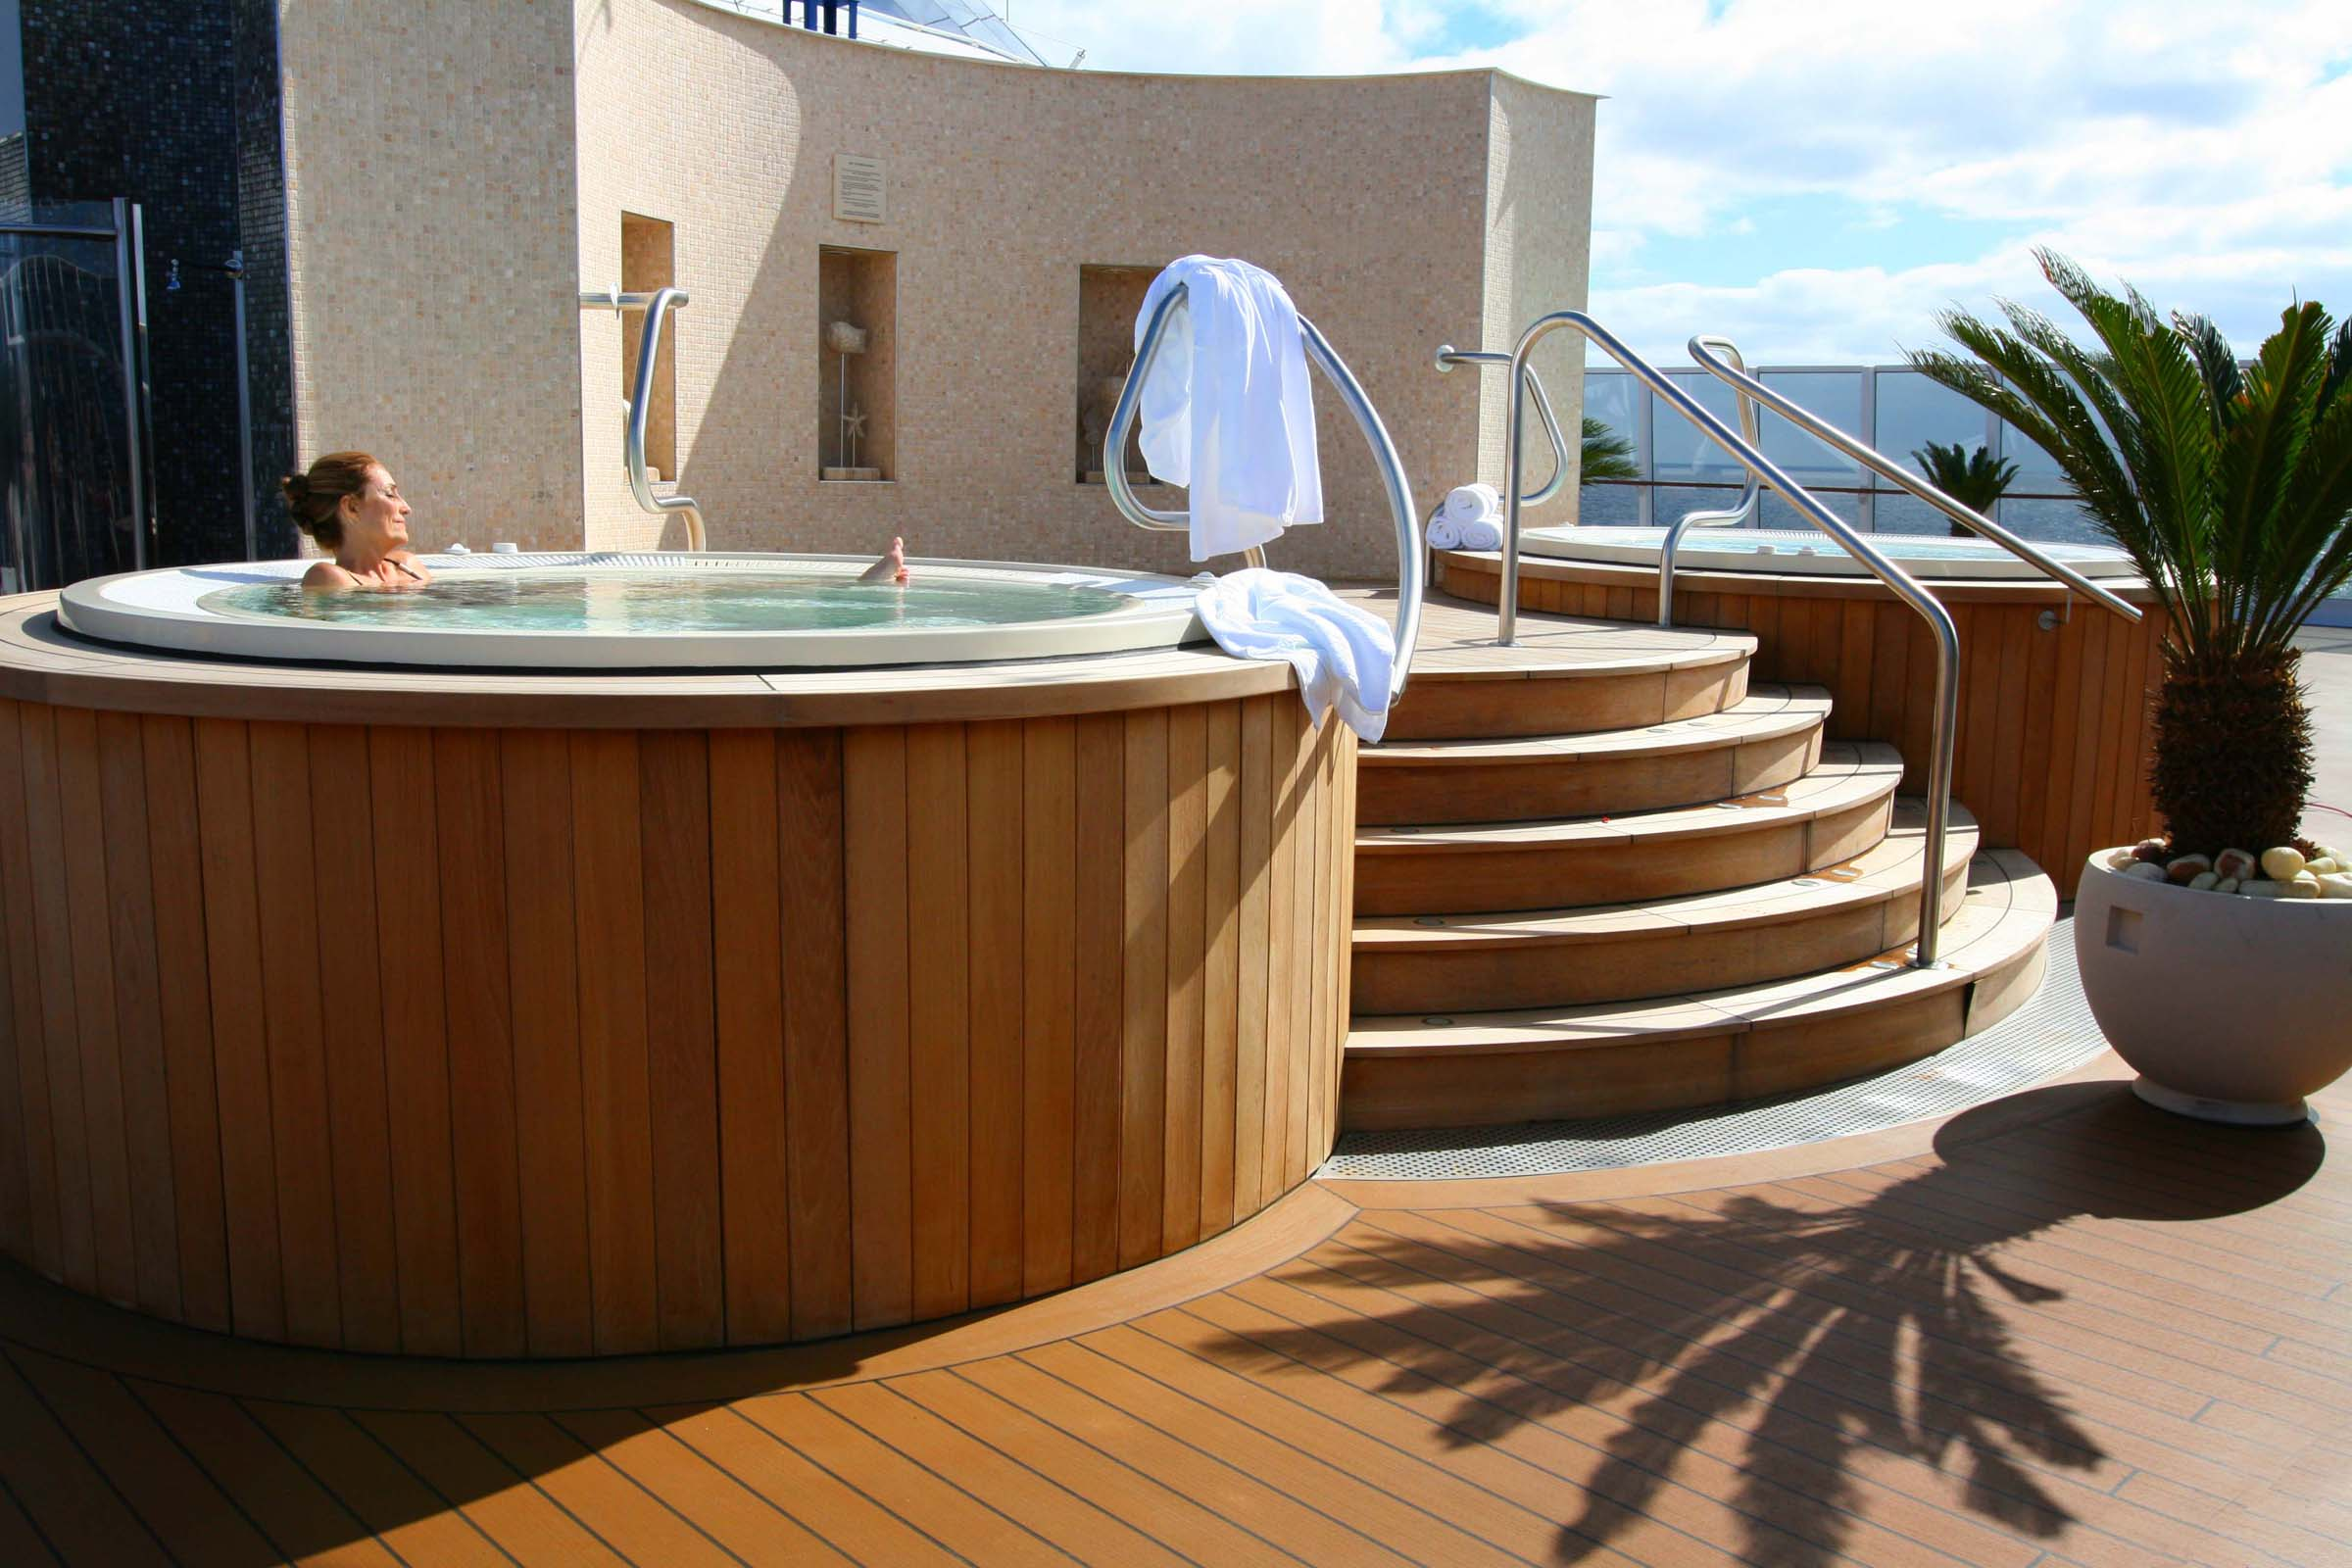 Oceania Cruises Oceania Class Interior Spa Private Terrace.jpg